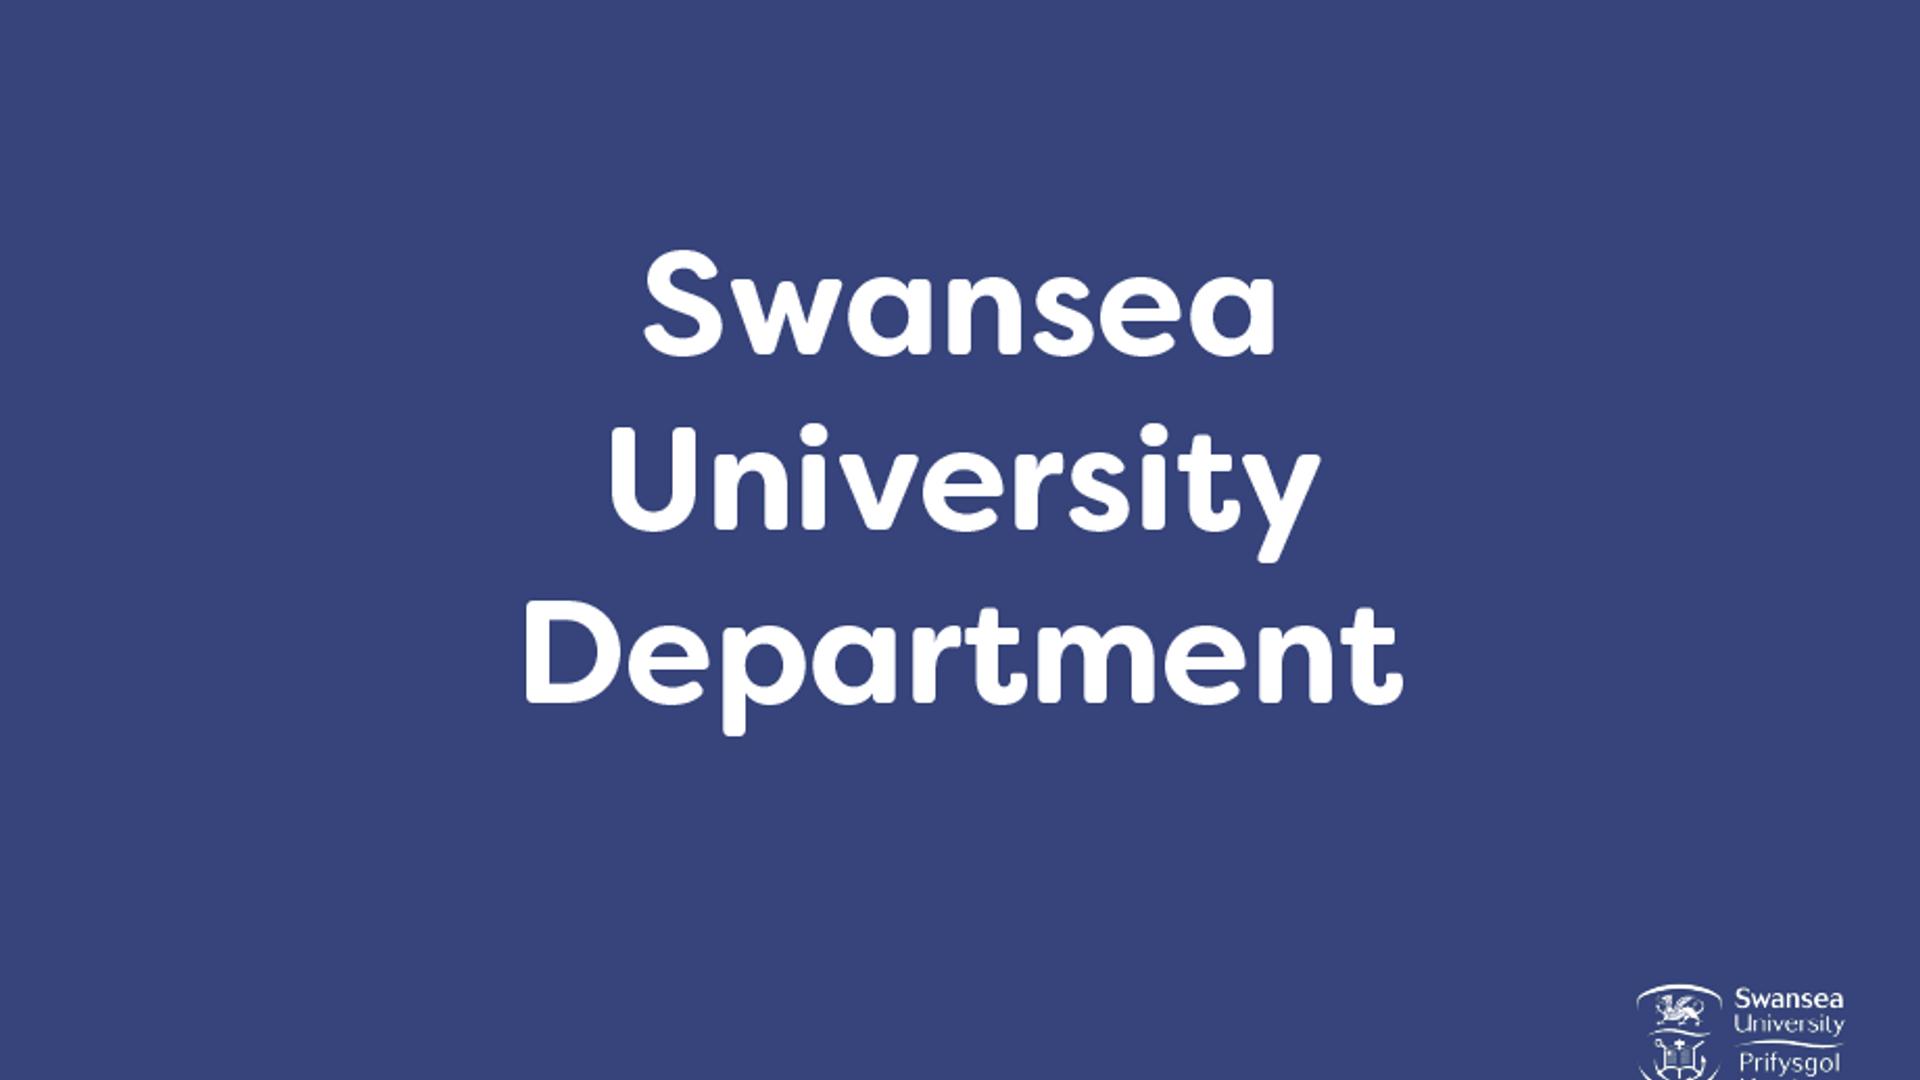 Centre for Academic Success